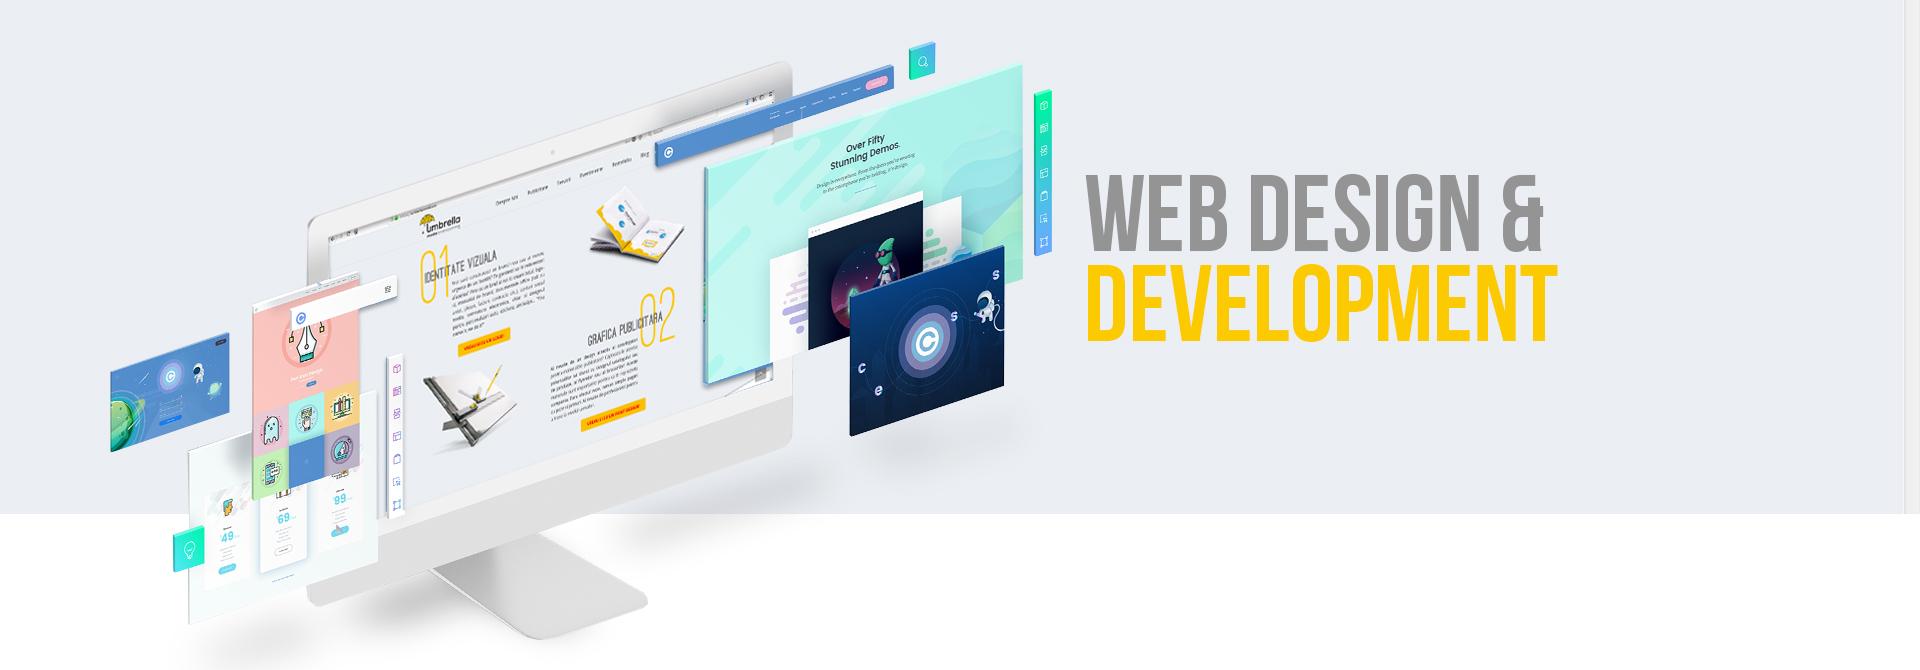 umbrella-media-web-design-development-craiova